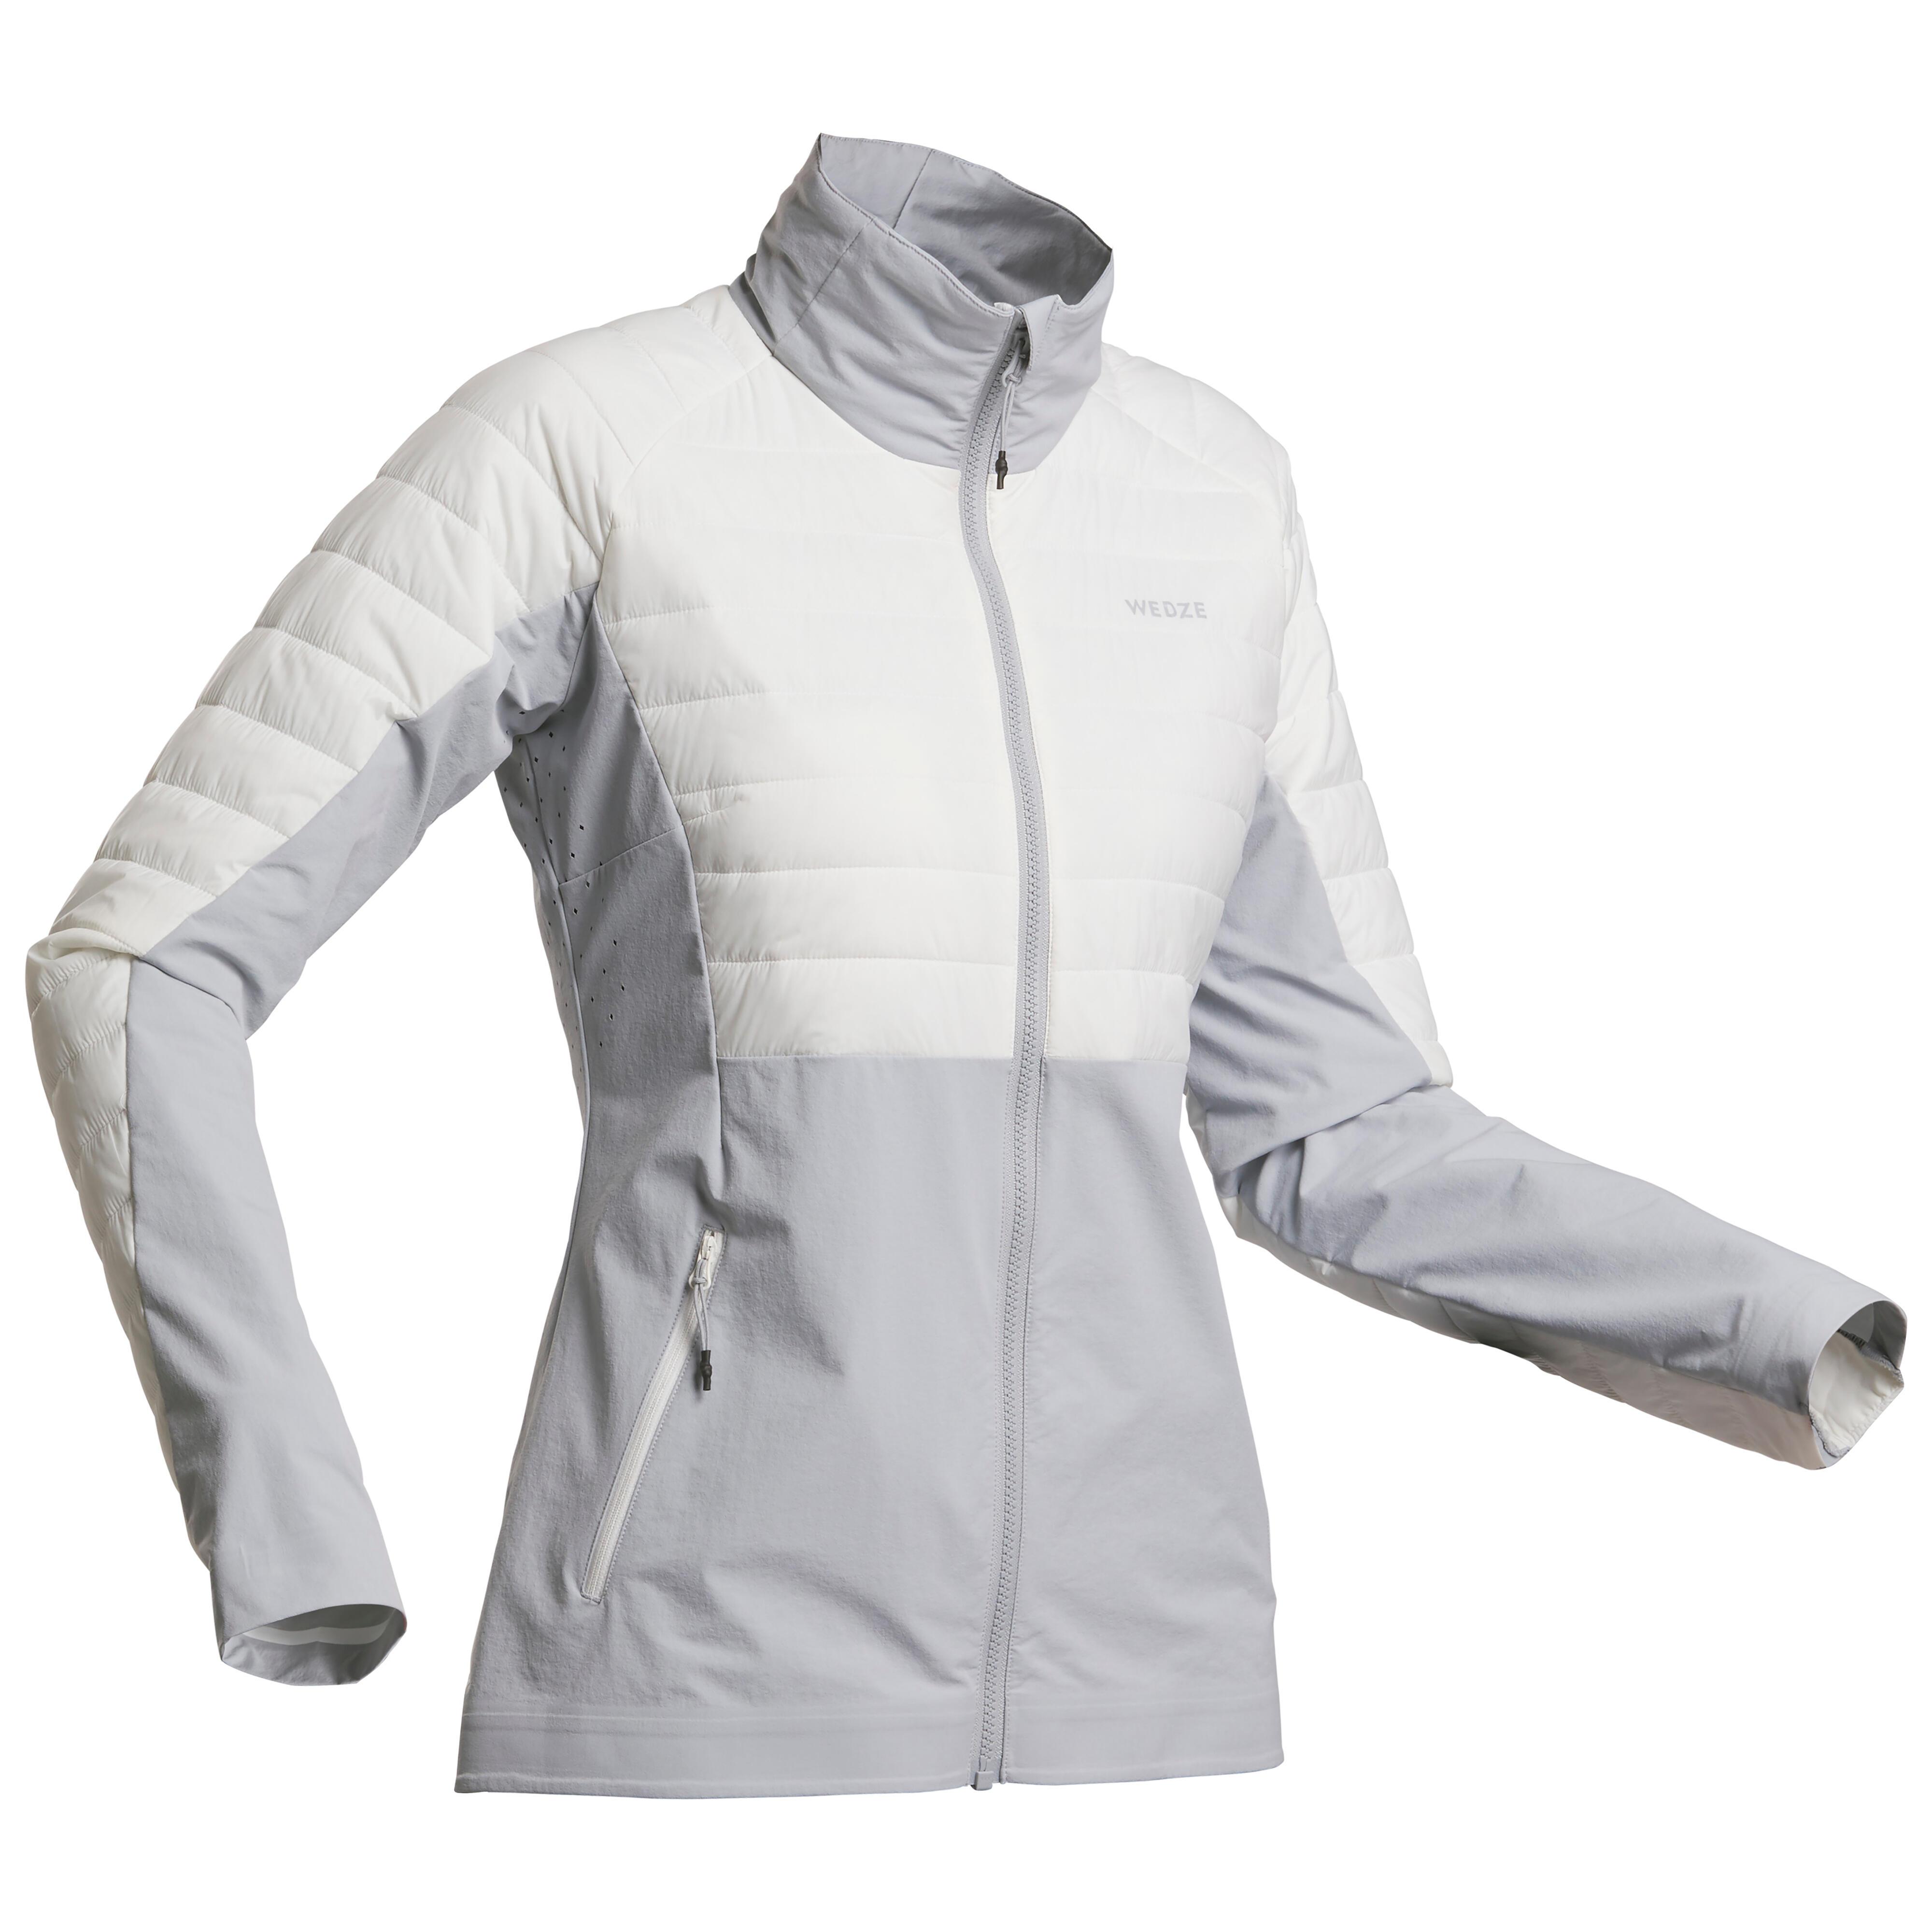 Jachetă FR 900 LIGHT Damă imagine